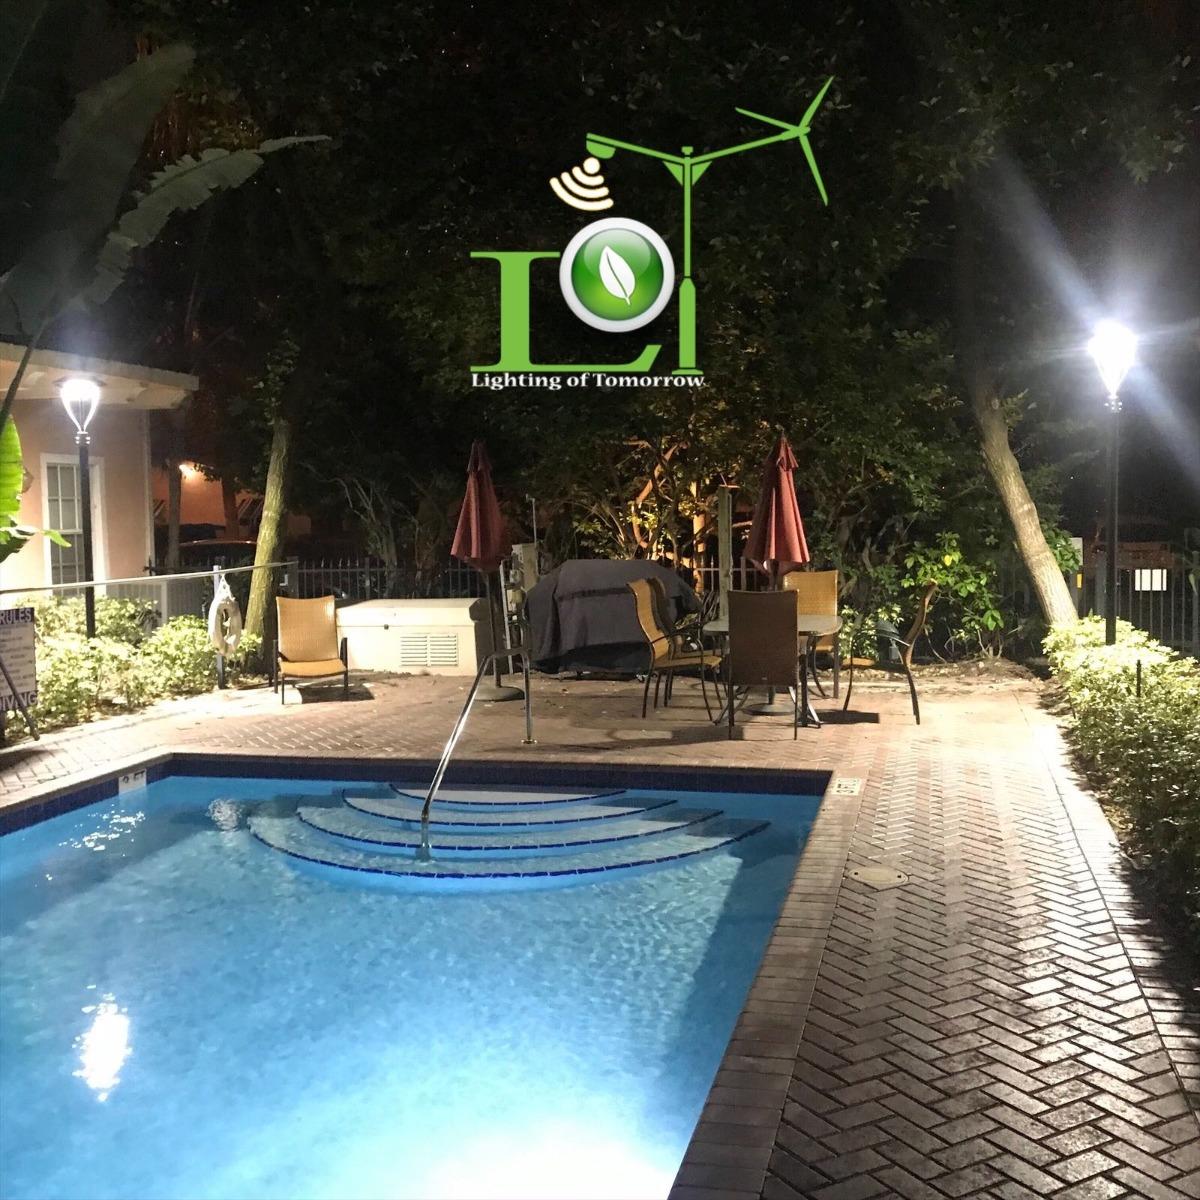 led-pool-area-lighting-of-tomorrow-3